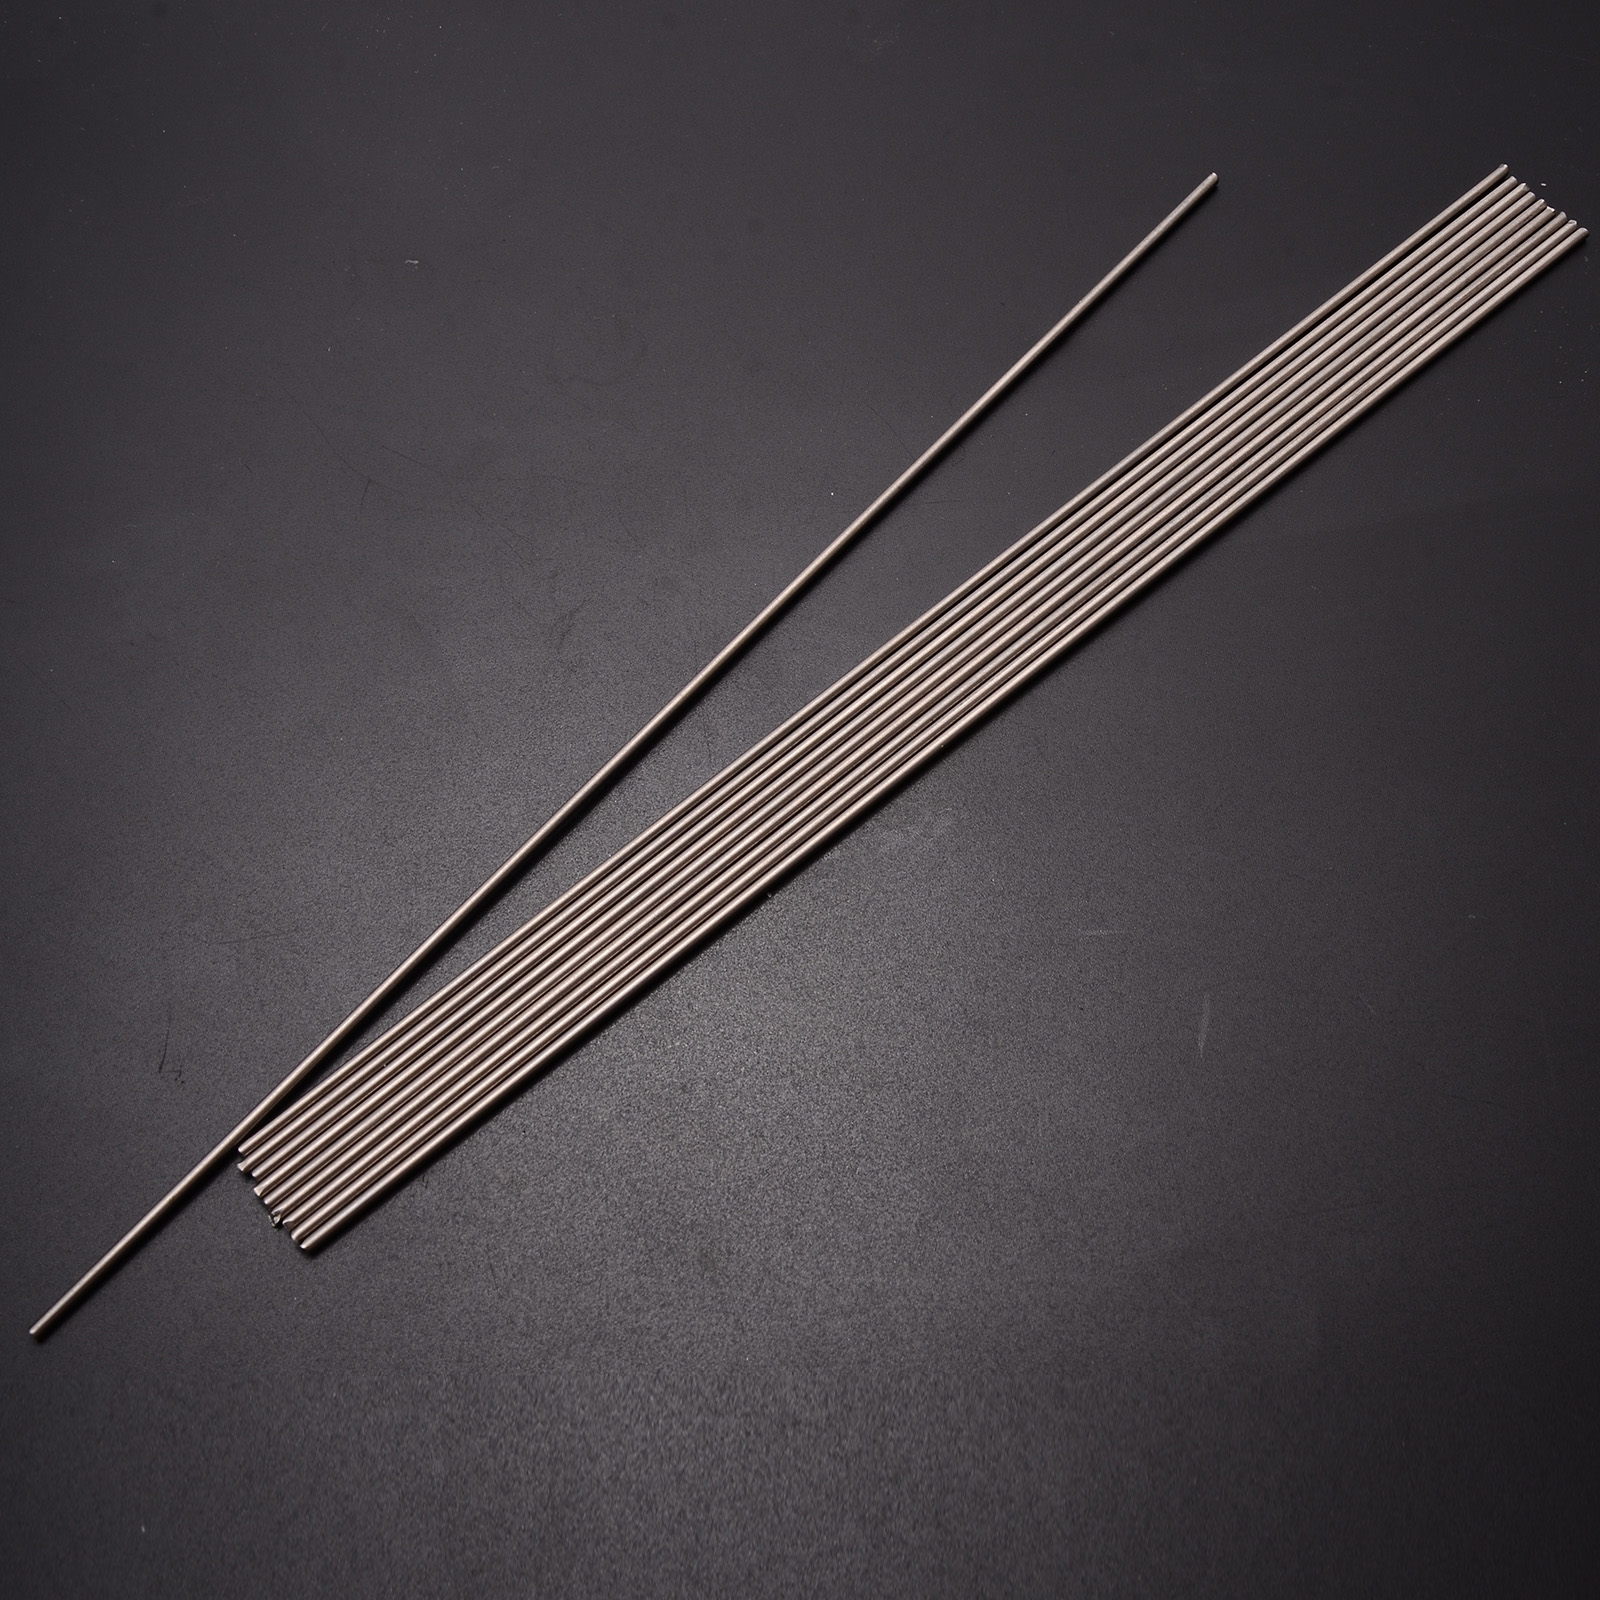 10pcs Ti Gr.5 Grade 5 Titanium Bar 6al-4v Round Welding Rods 2mm Diameter 250mm Length